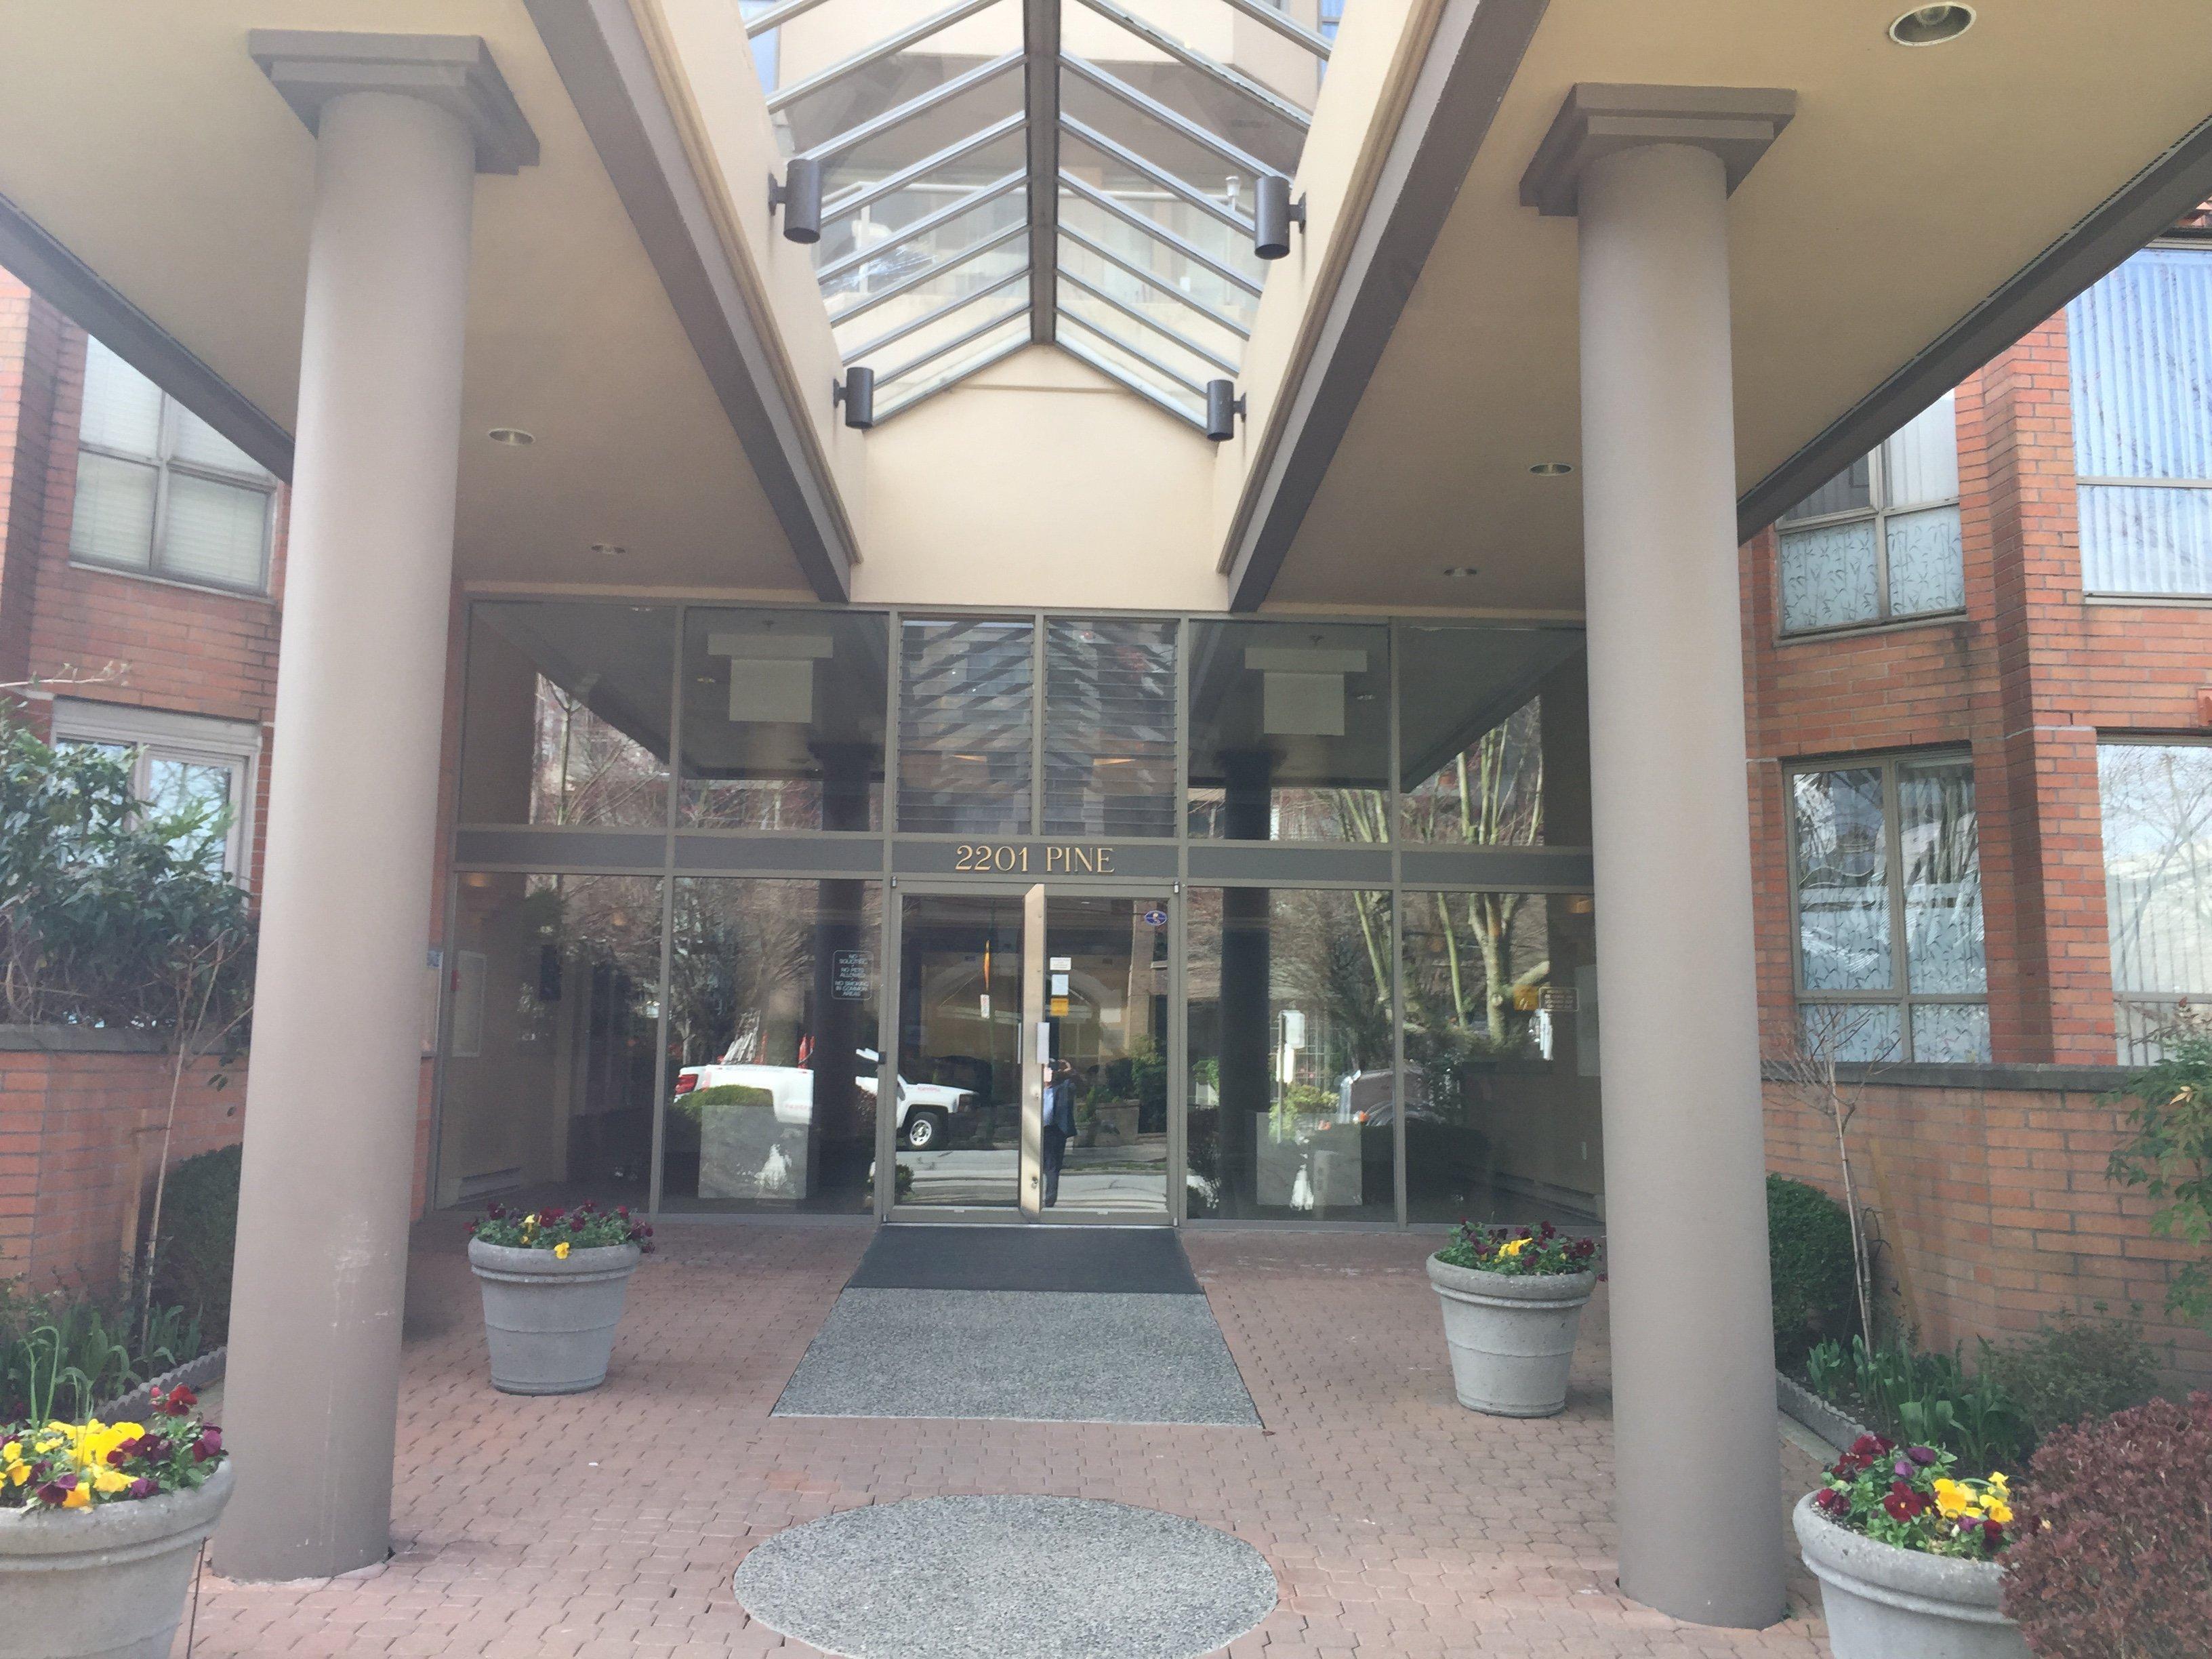 2201 Pine Entrance!